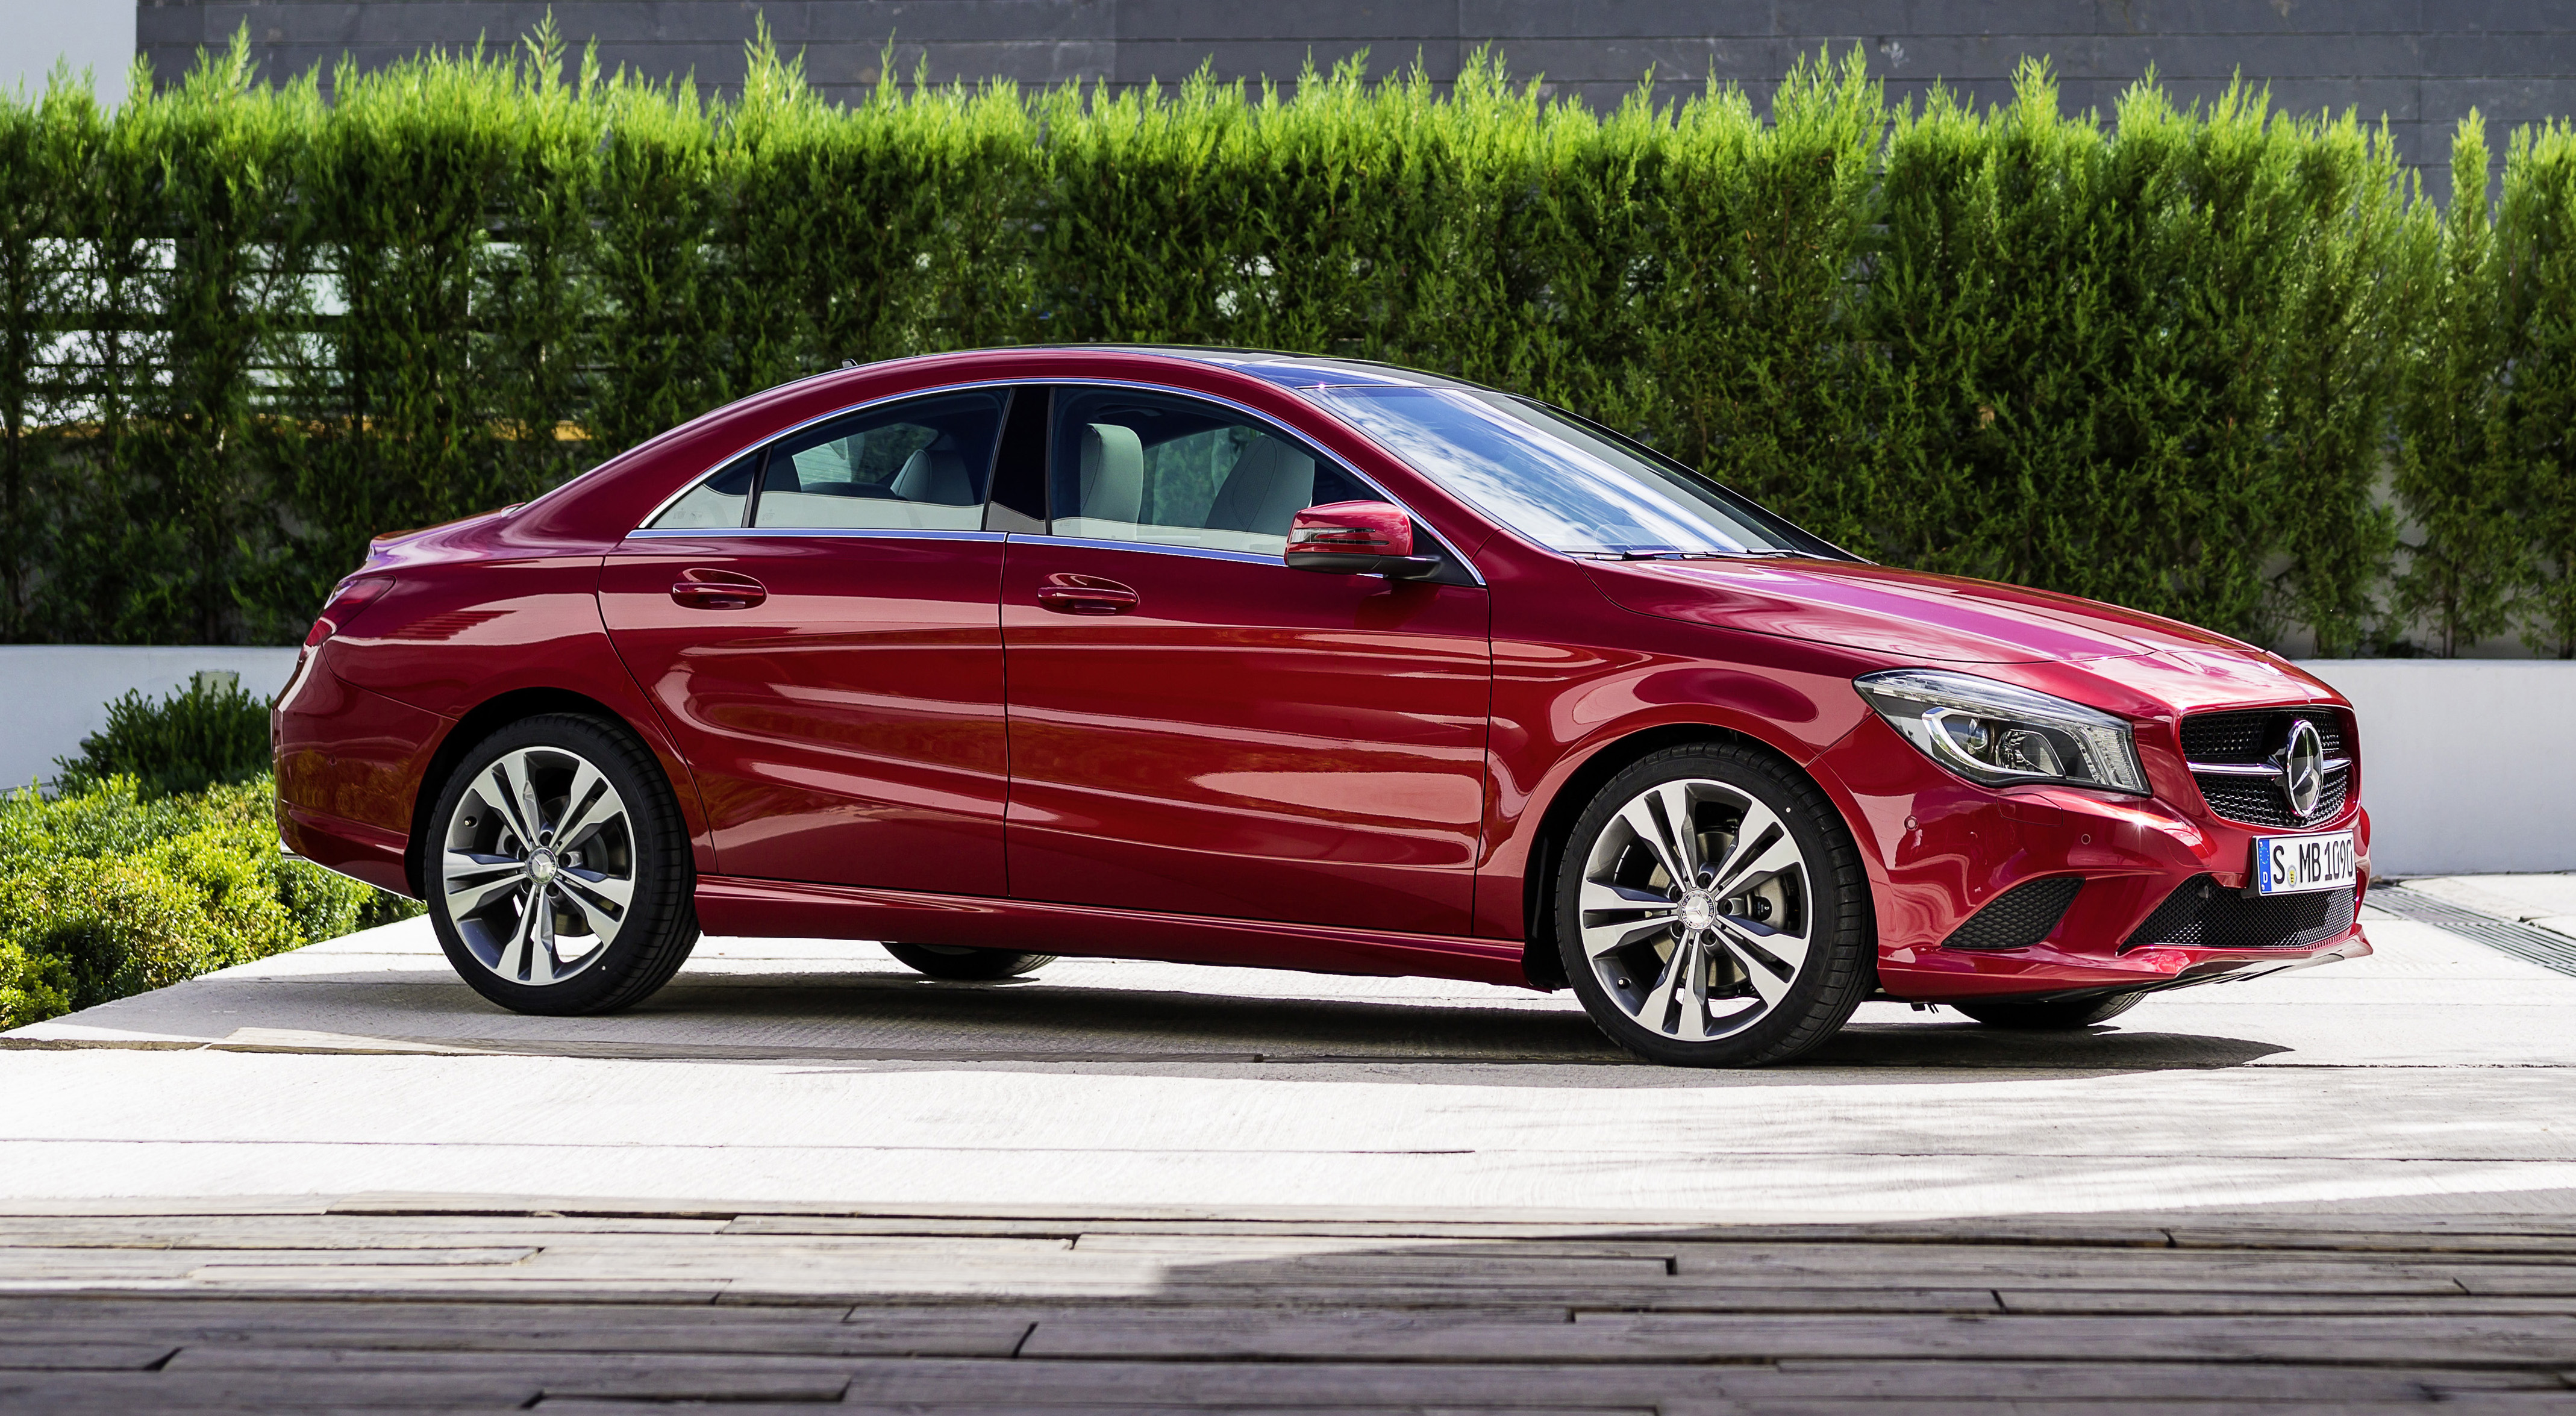 New mercedes benz cla class makes its debut image 149615 for Mercedes benz class cla